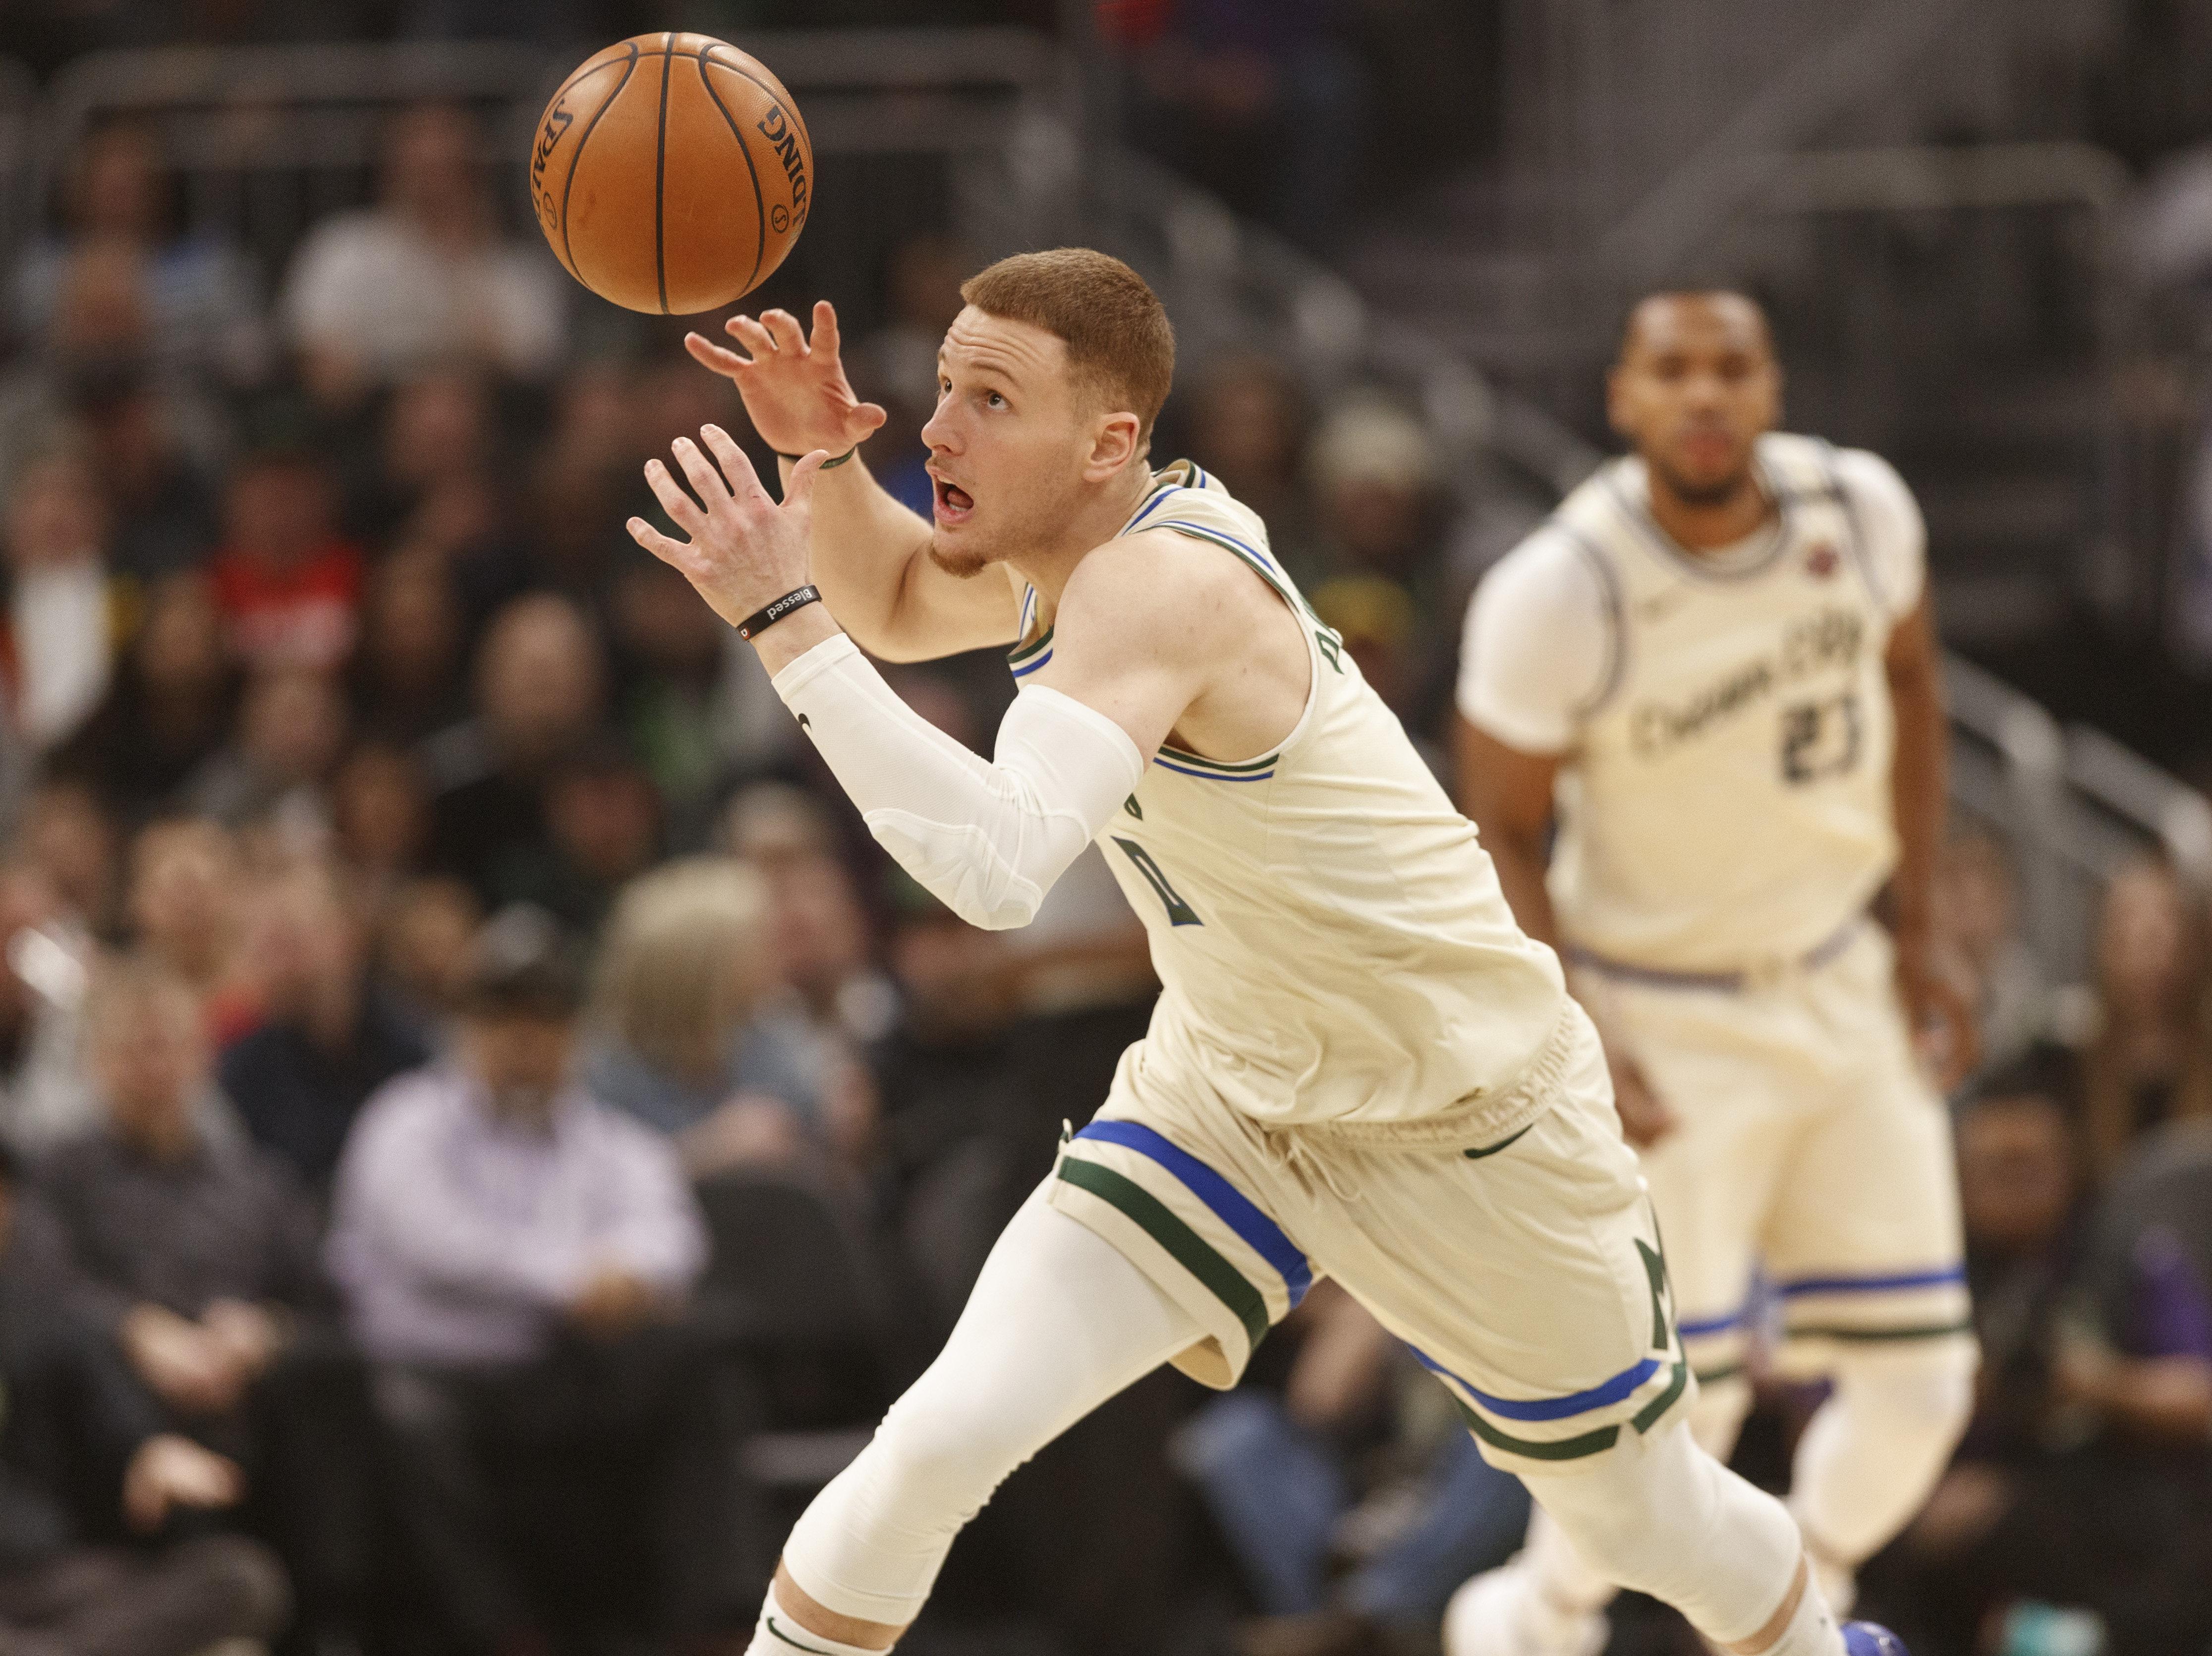 Milwaukee Bucks deserve to be favorite to win NBA title